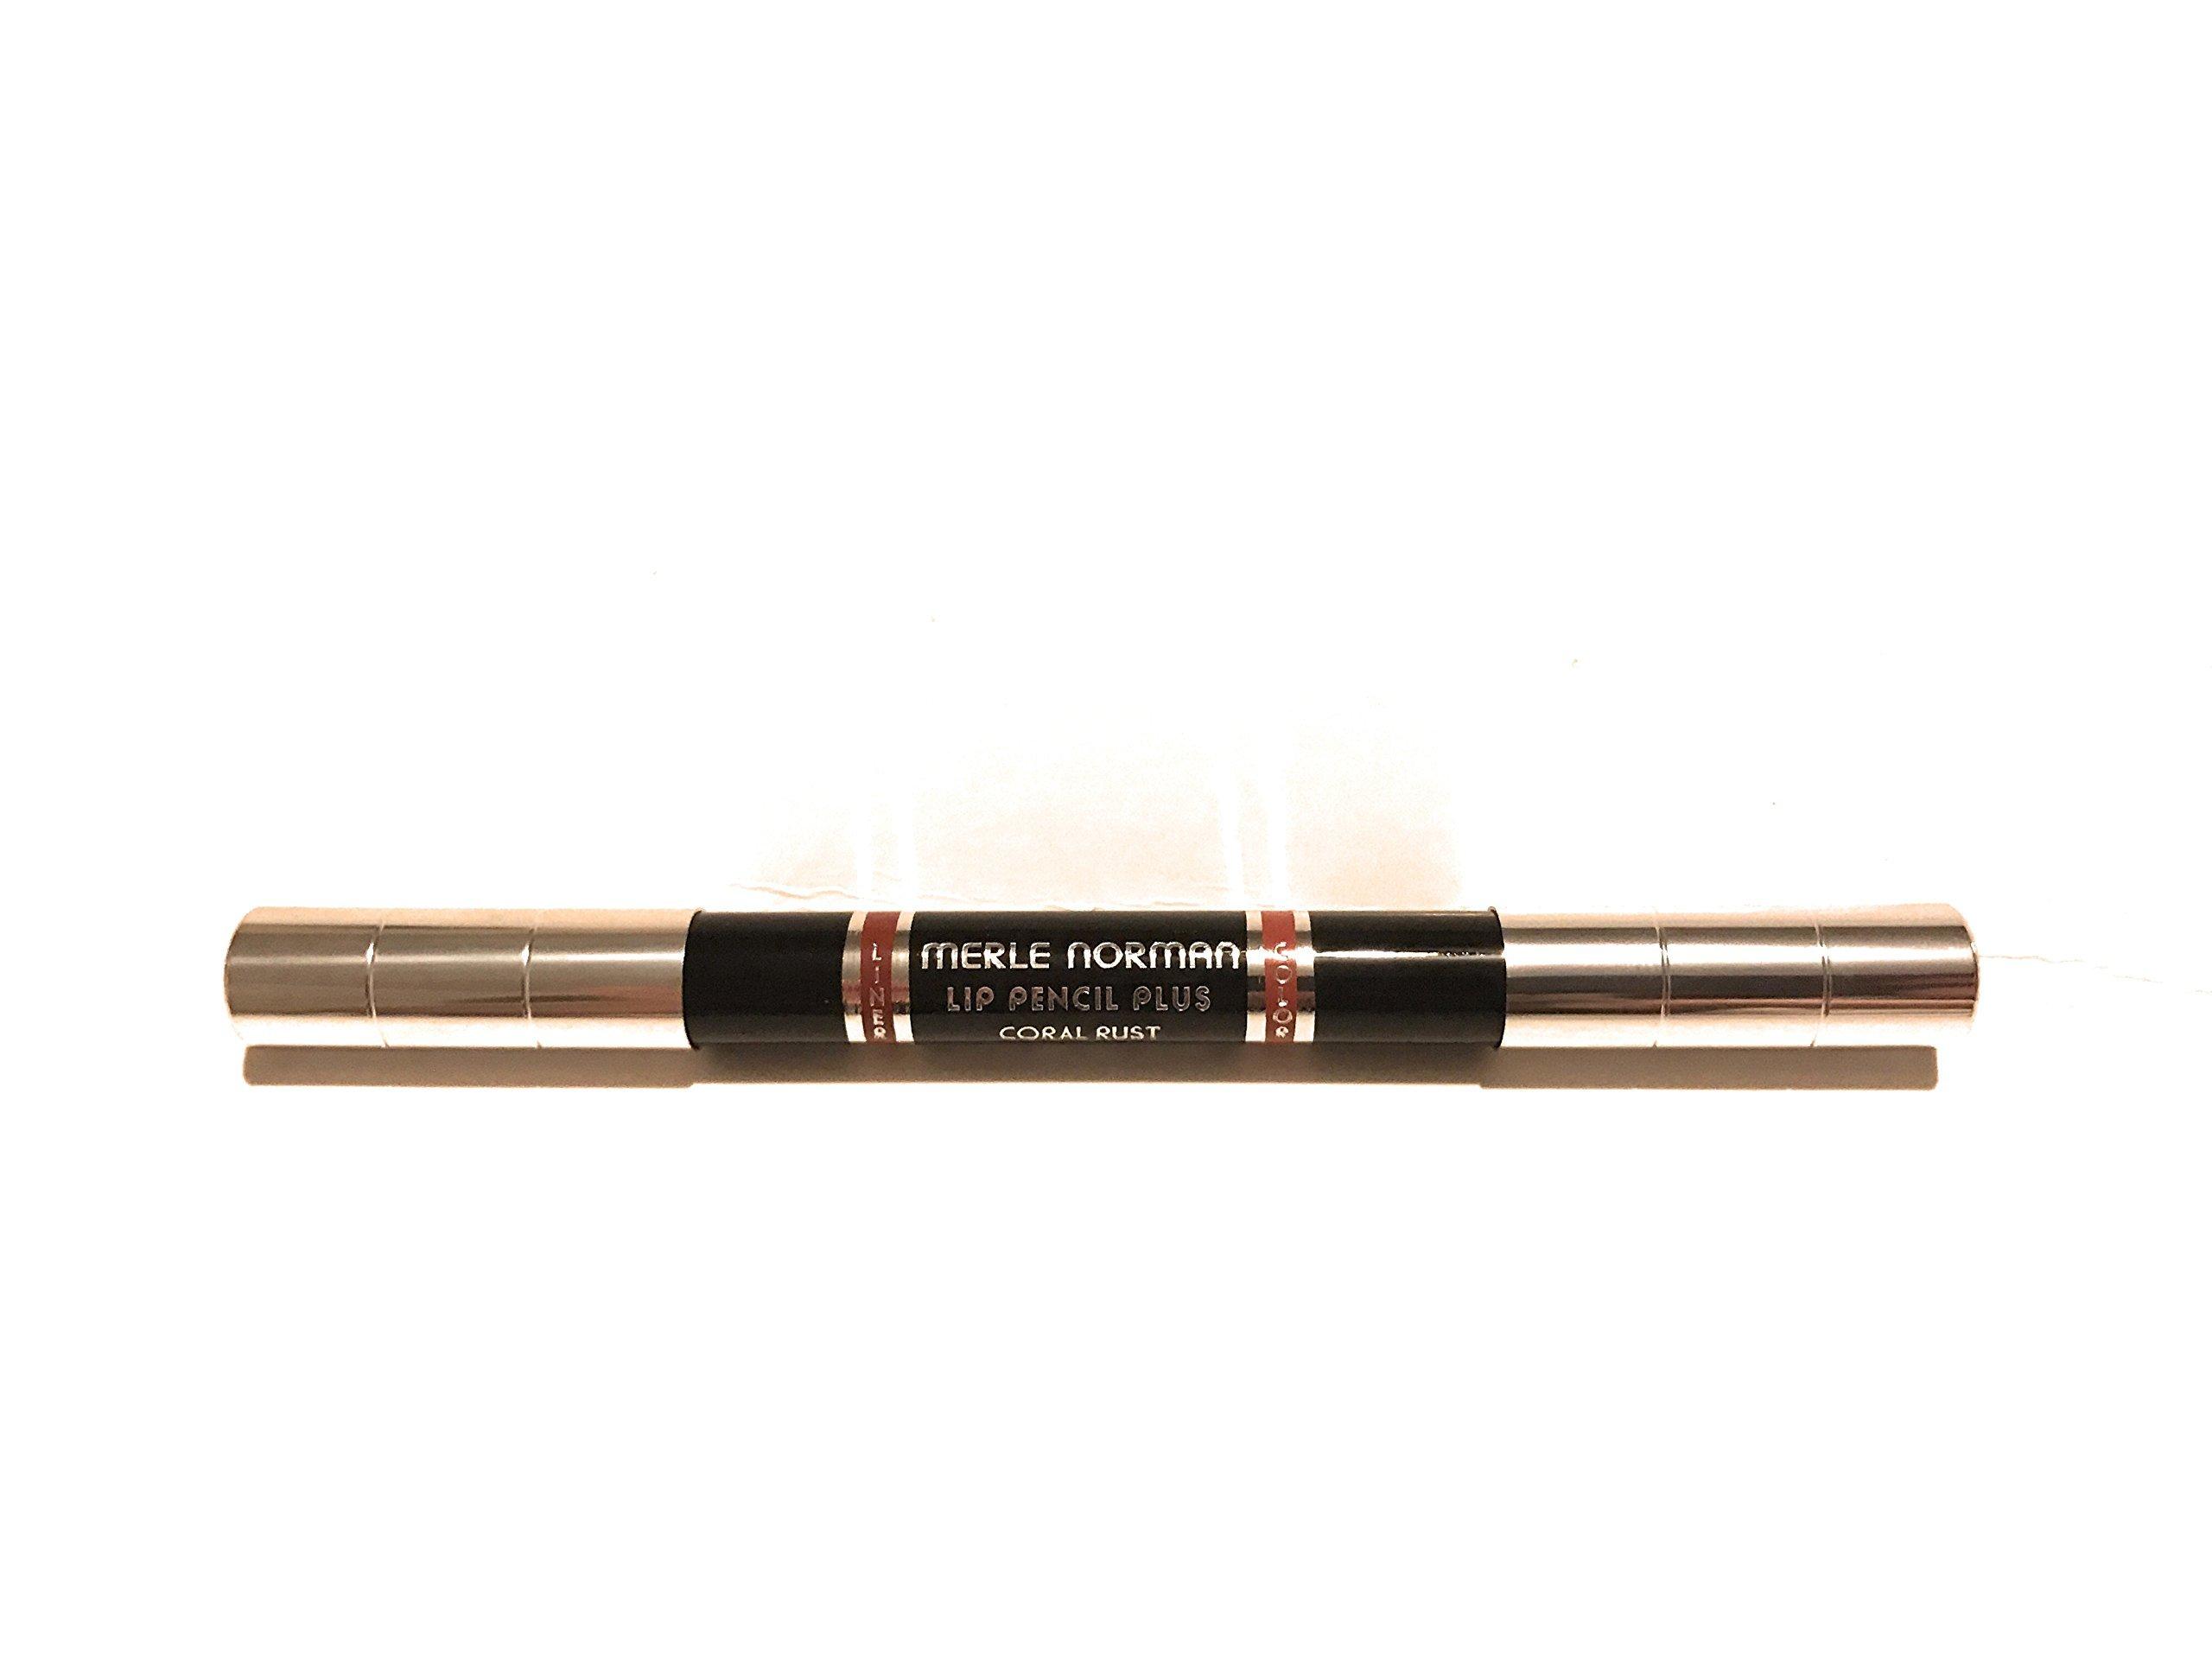 Merle Norman - Coral Rust Big Lip Pencil by Merle